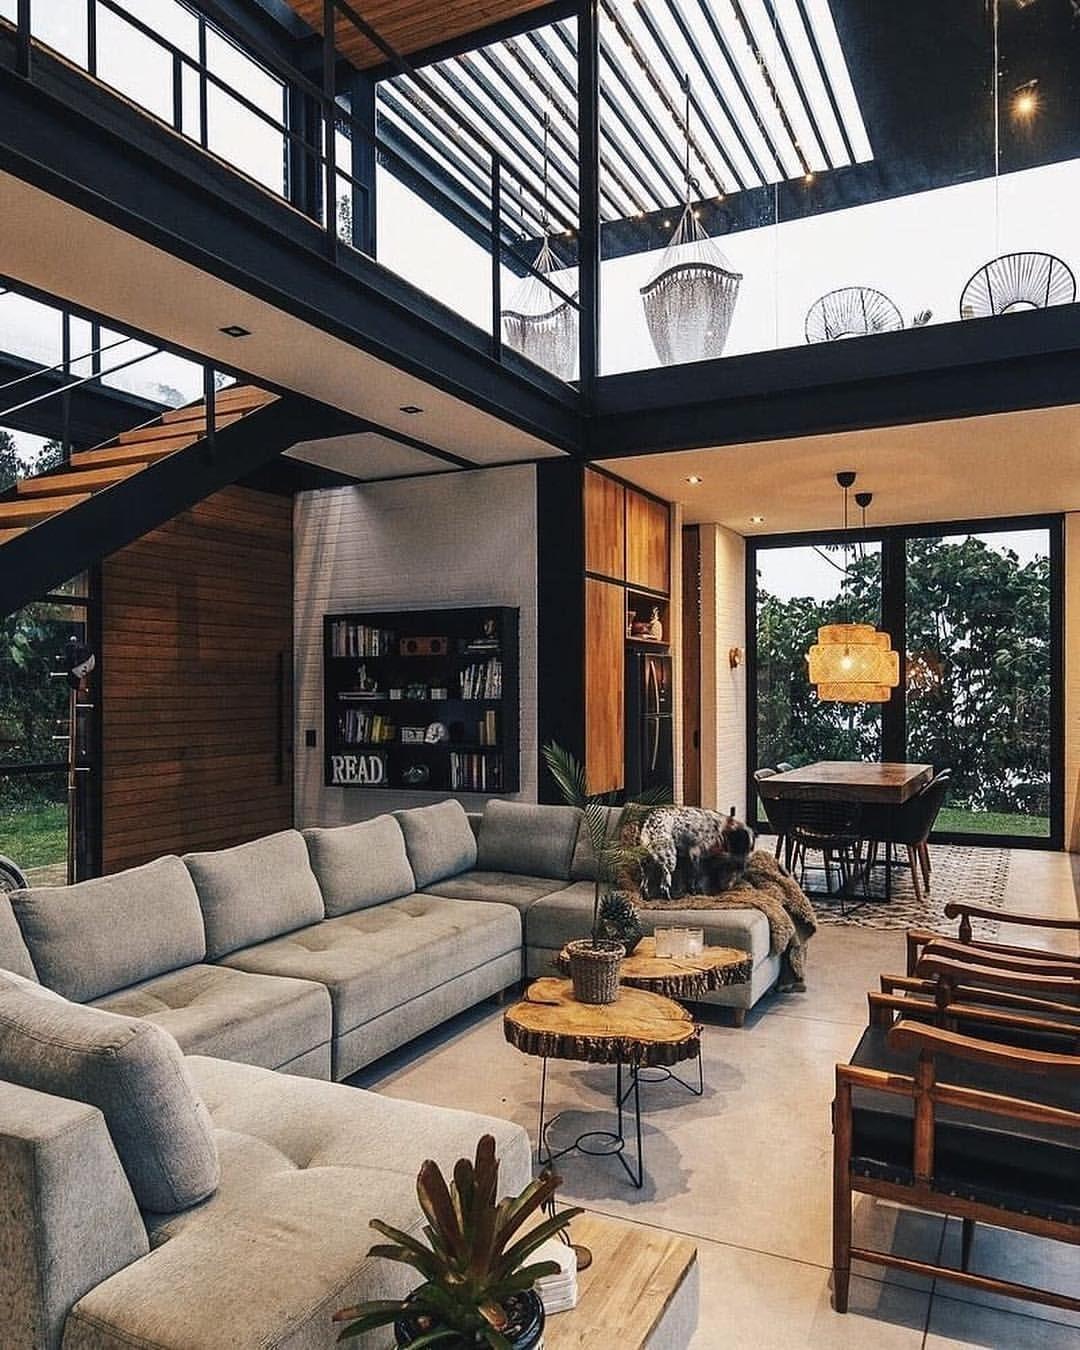 LOFT INTERIOR DESIGN IDEAS (loft_interior) • Instagram